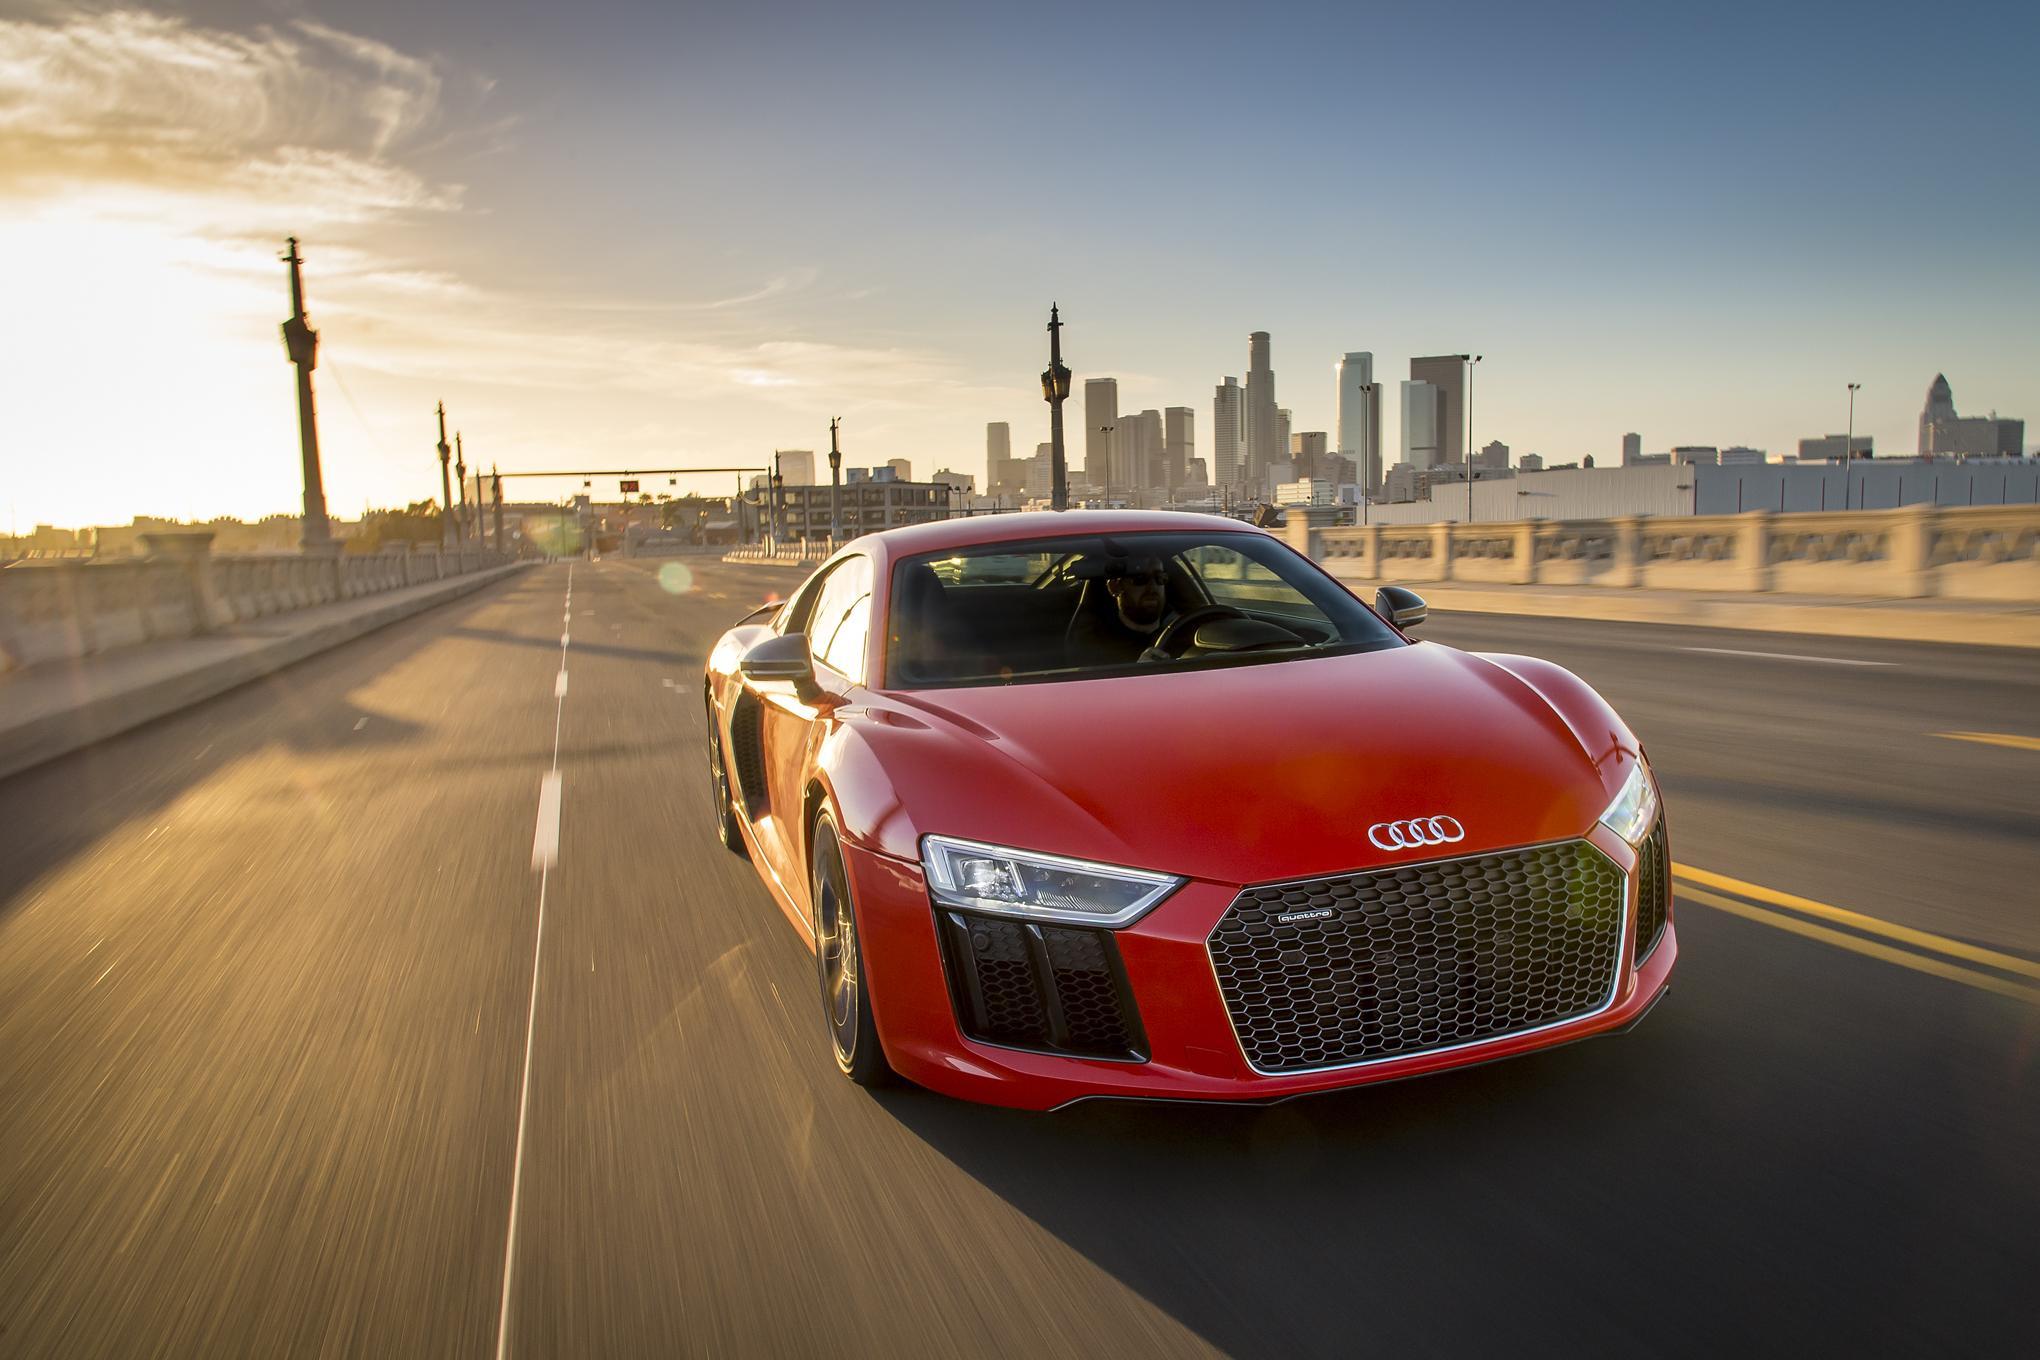 Audi R8 V10 Plus Mk II laptimes specs performance data